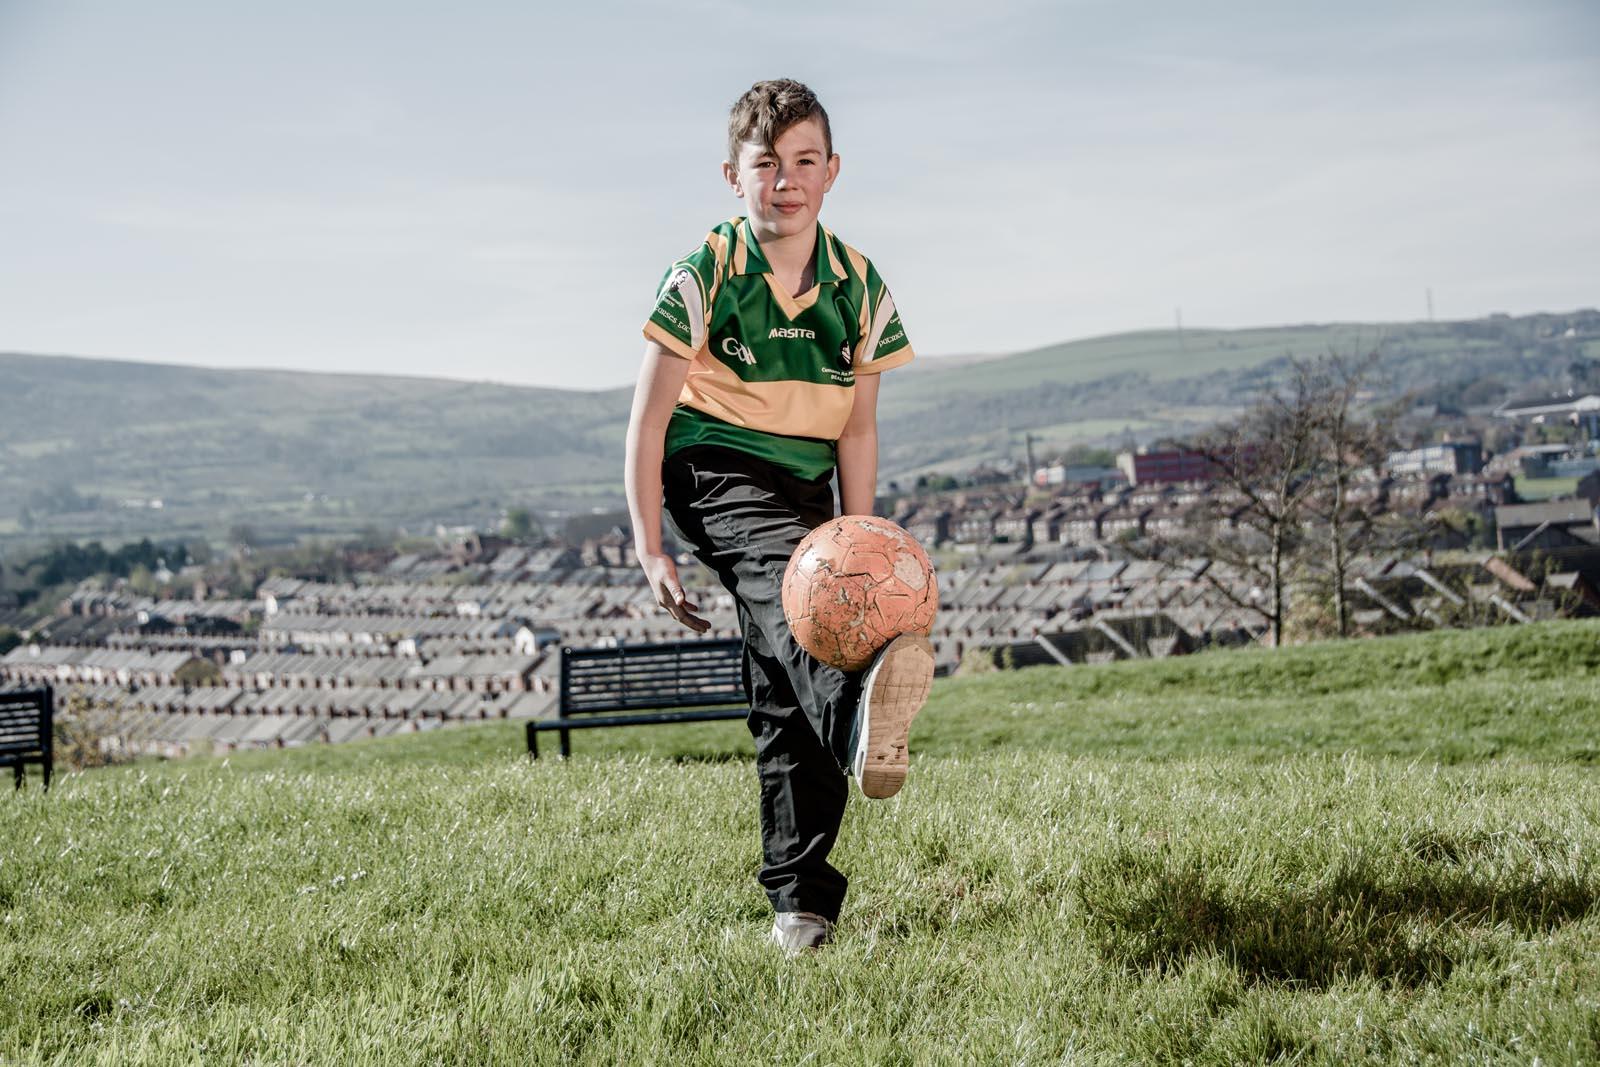 Boy wearing GAA top in park - photo 5334 by Stephen S T Bradley photographer Dublin and Belfast, Ireland